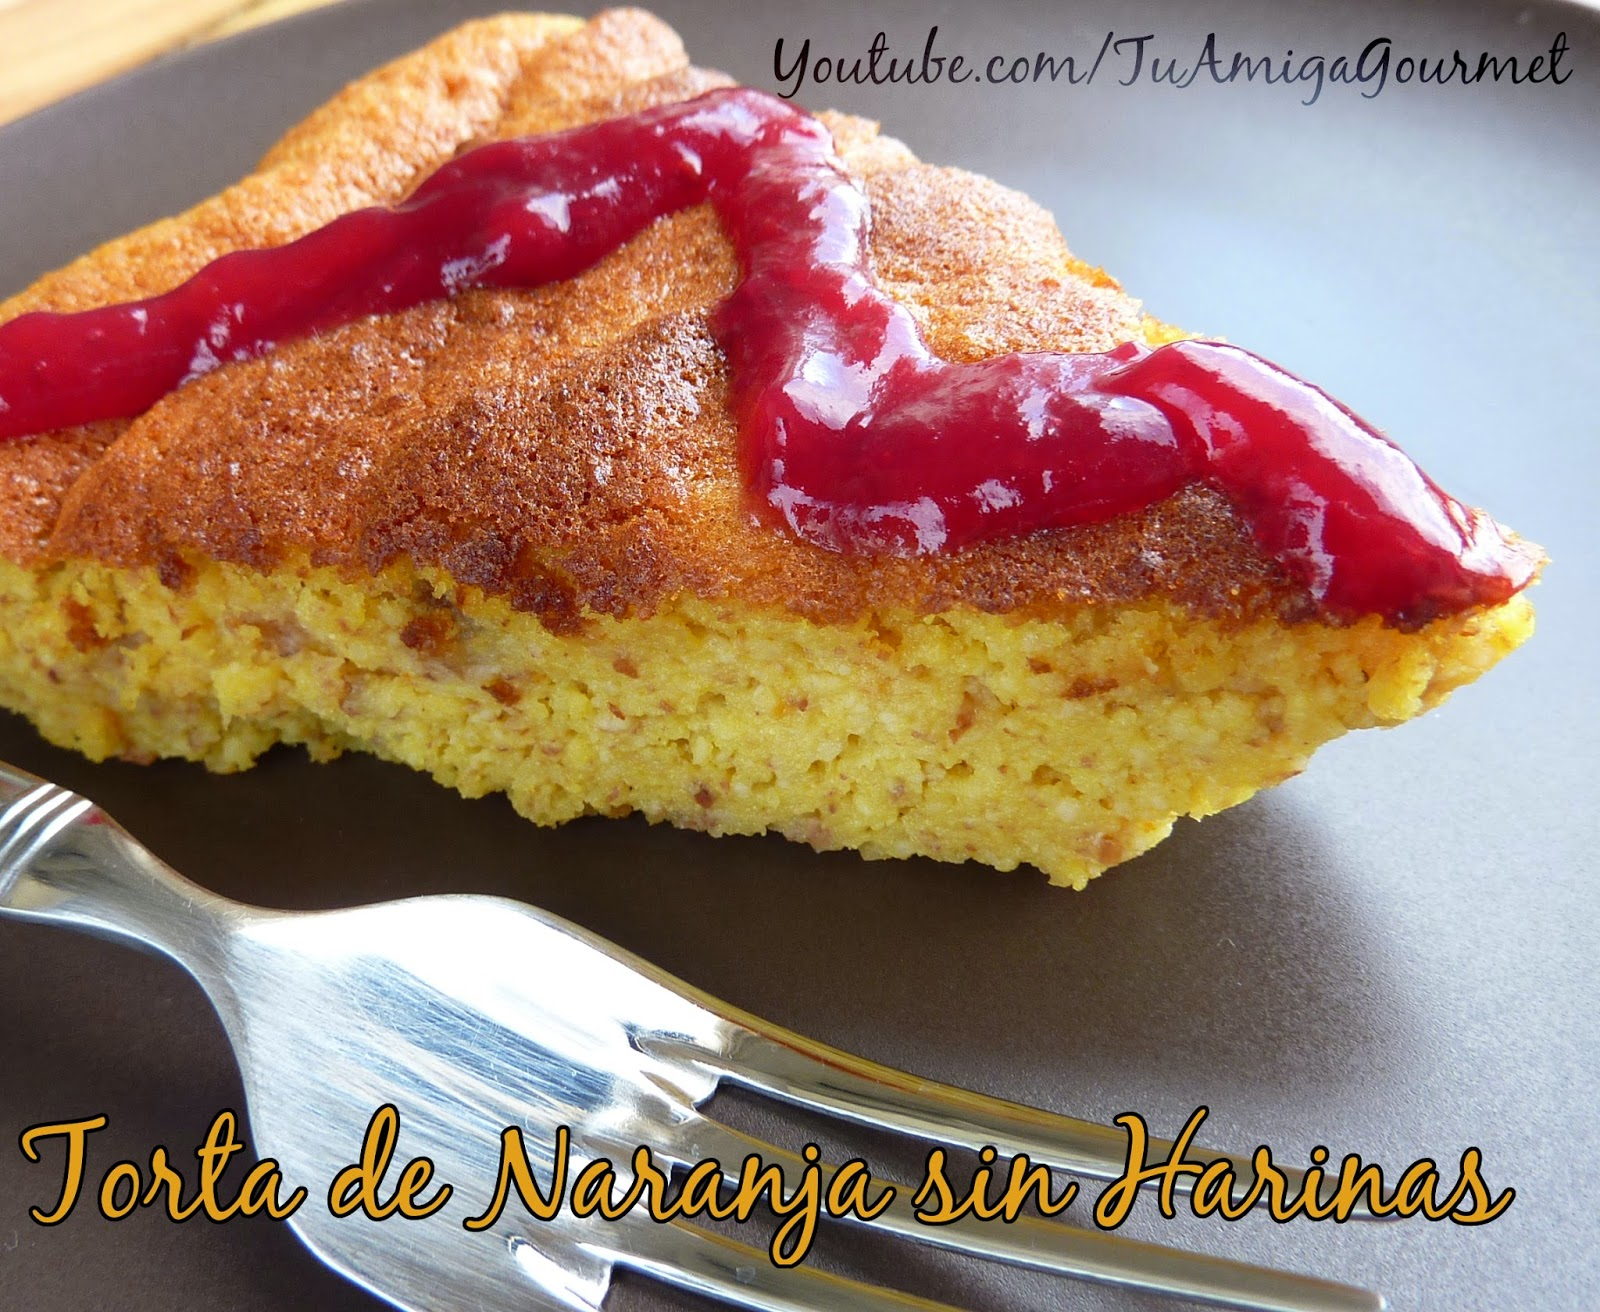 Receta: Como preparar Pastel o Torta de Naranja sin harinas